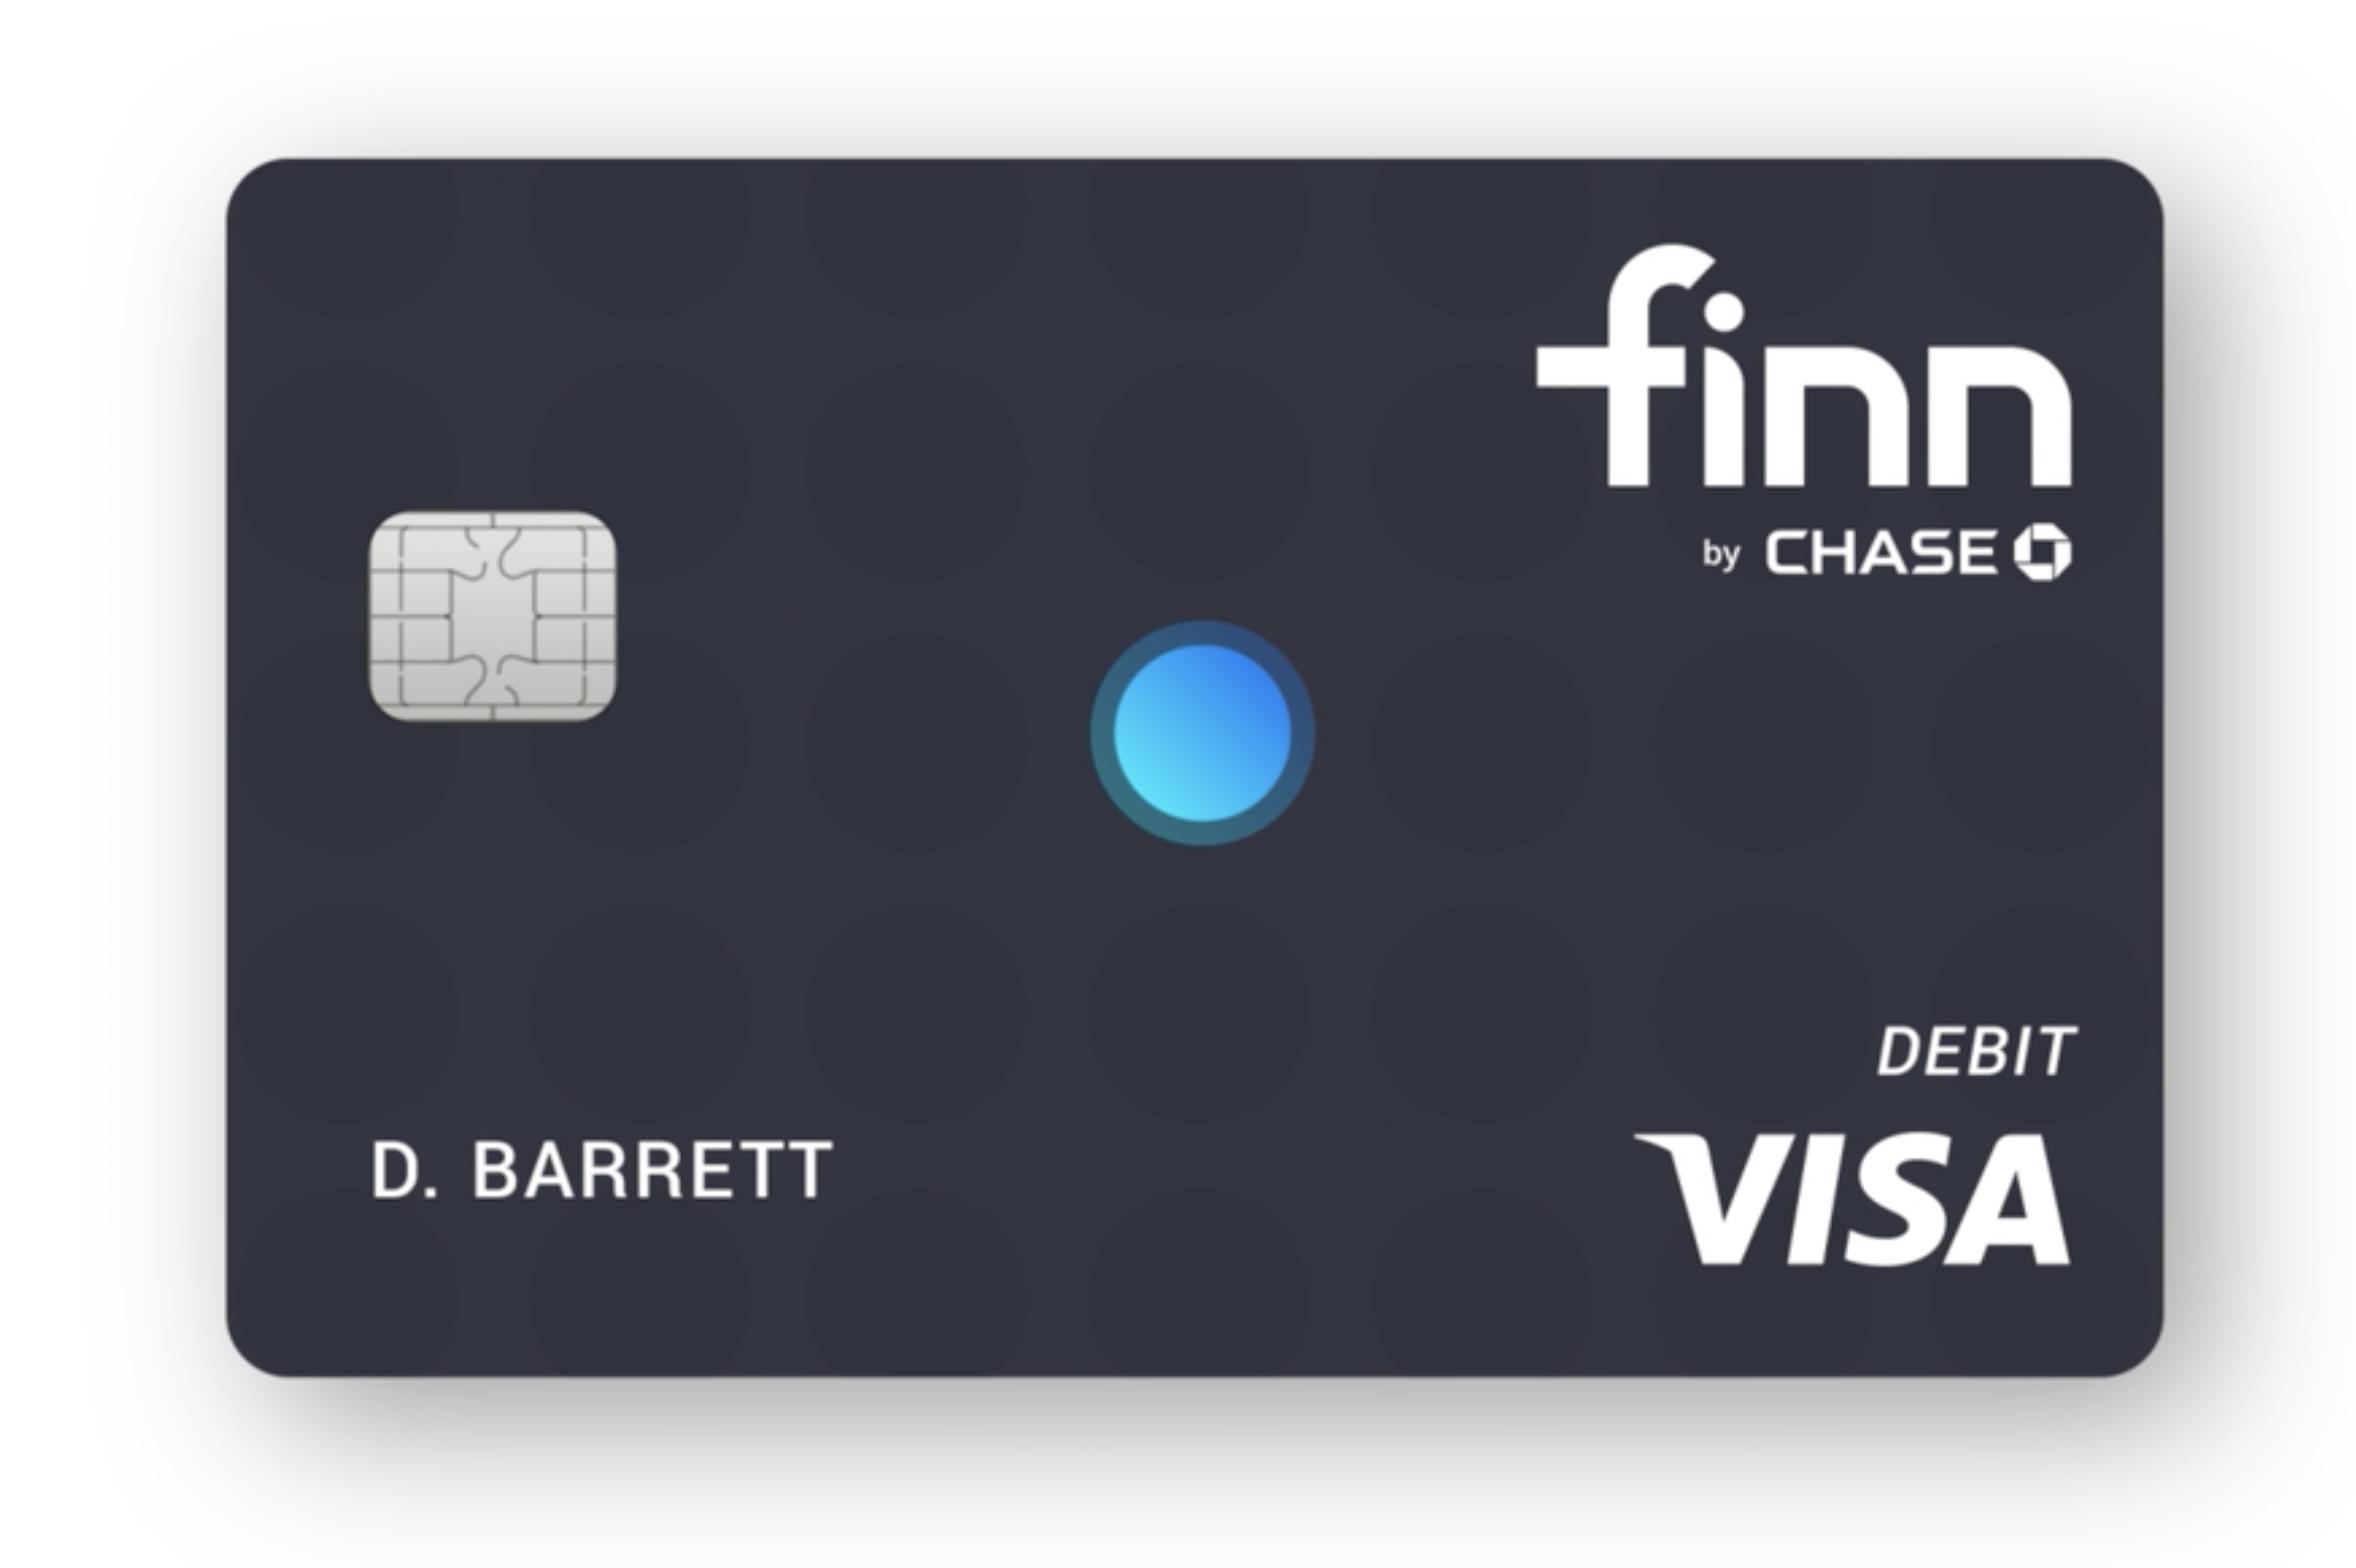 The Finn By Chase Debit Card